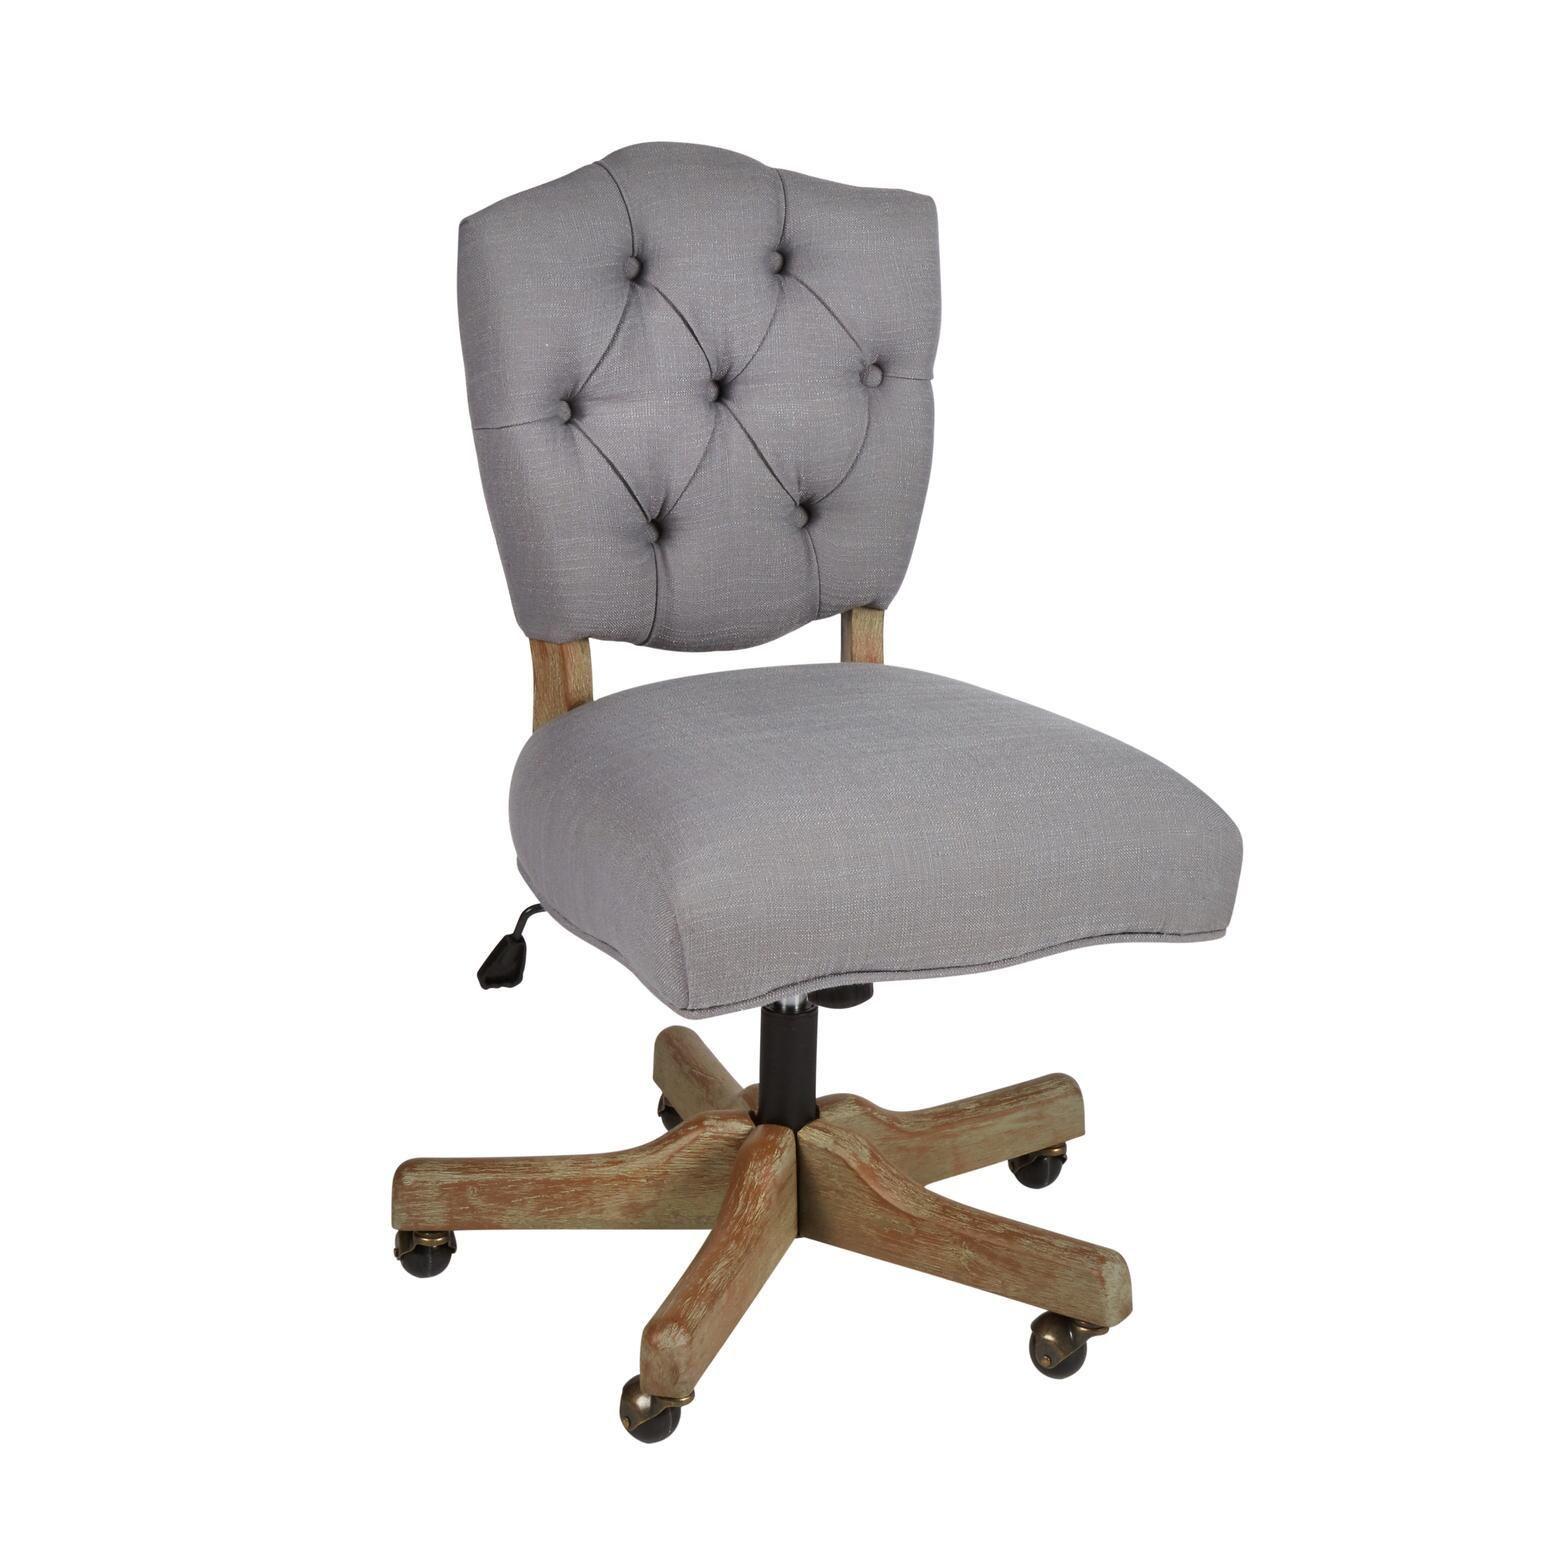 Kelsey Upholstered Rolling Office Chair Upholstered